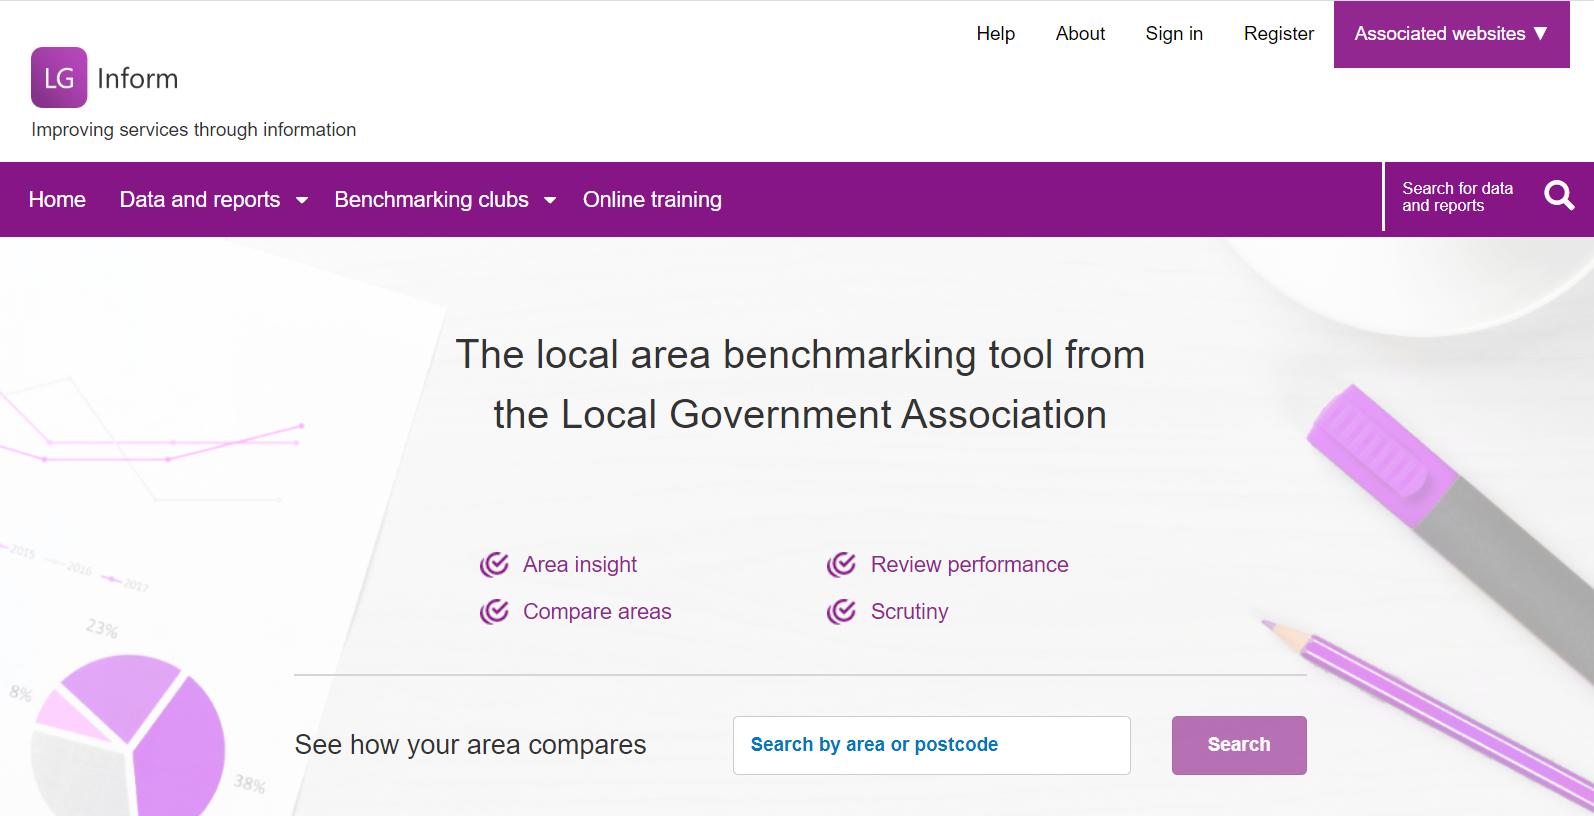 Screenshot showing the LG Inform Landing/Home Page